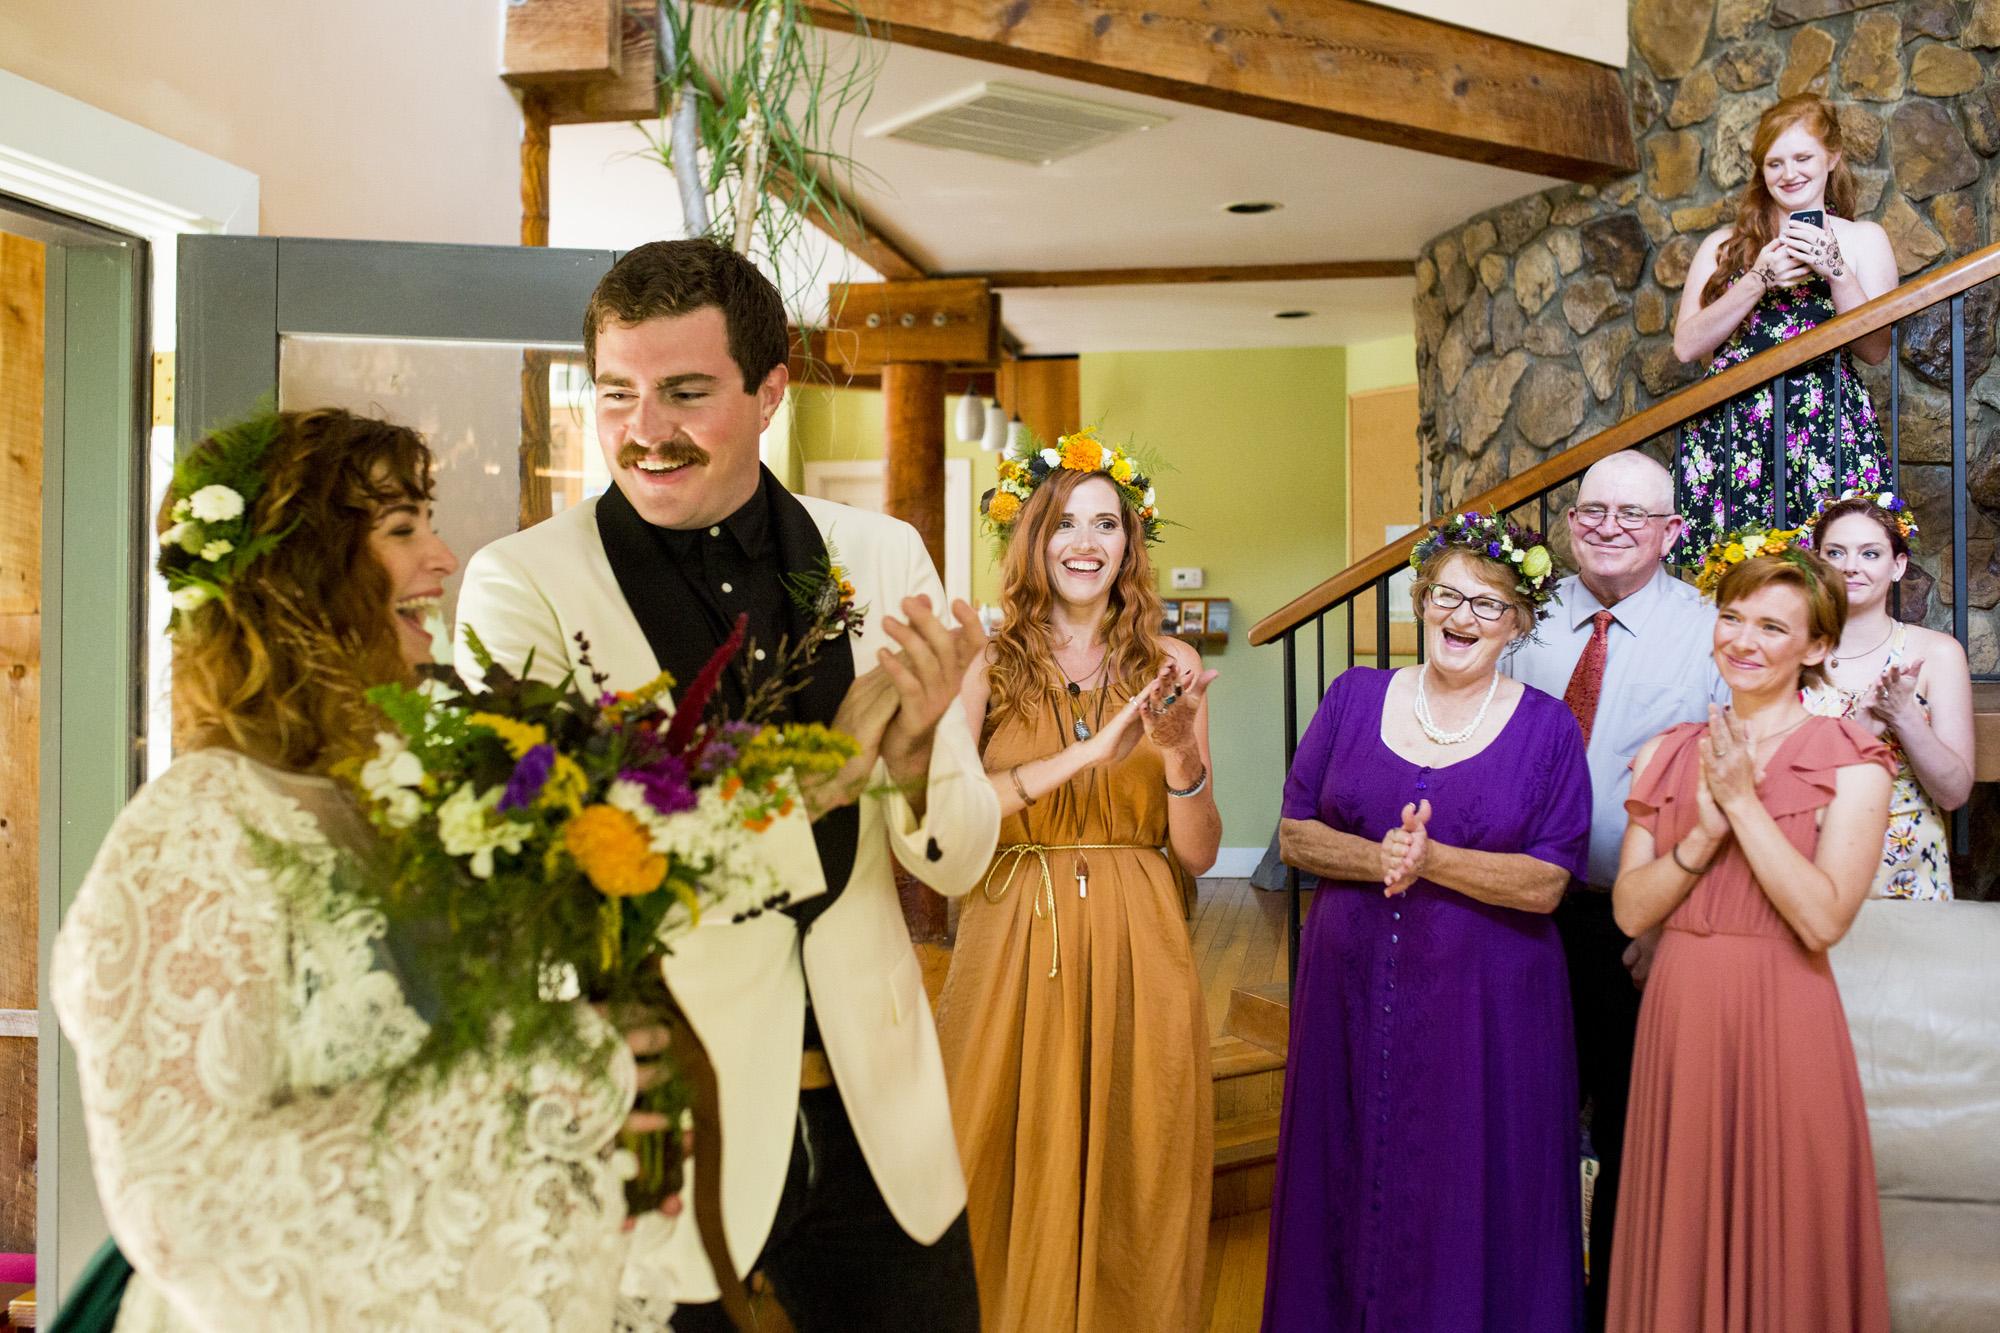 Seriously_Sabrina_Photography_Red_River_Gorge_Kentucky_Wedding_ShawnDana78.jpg